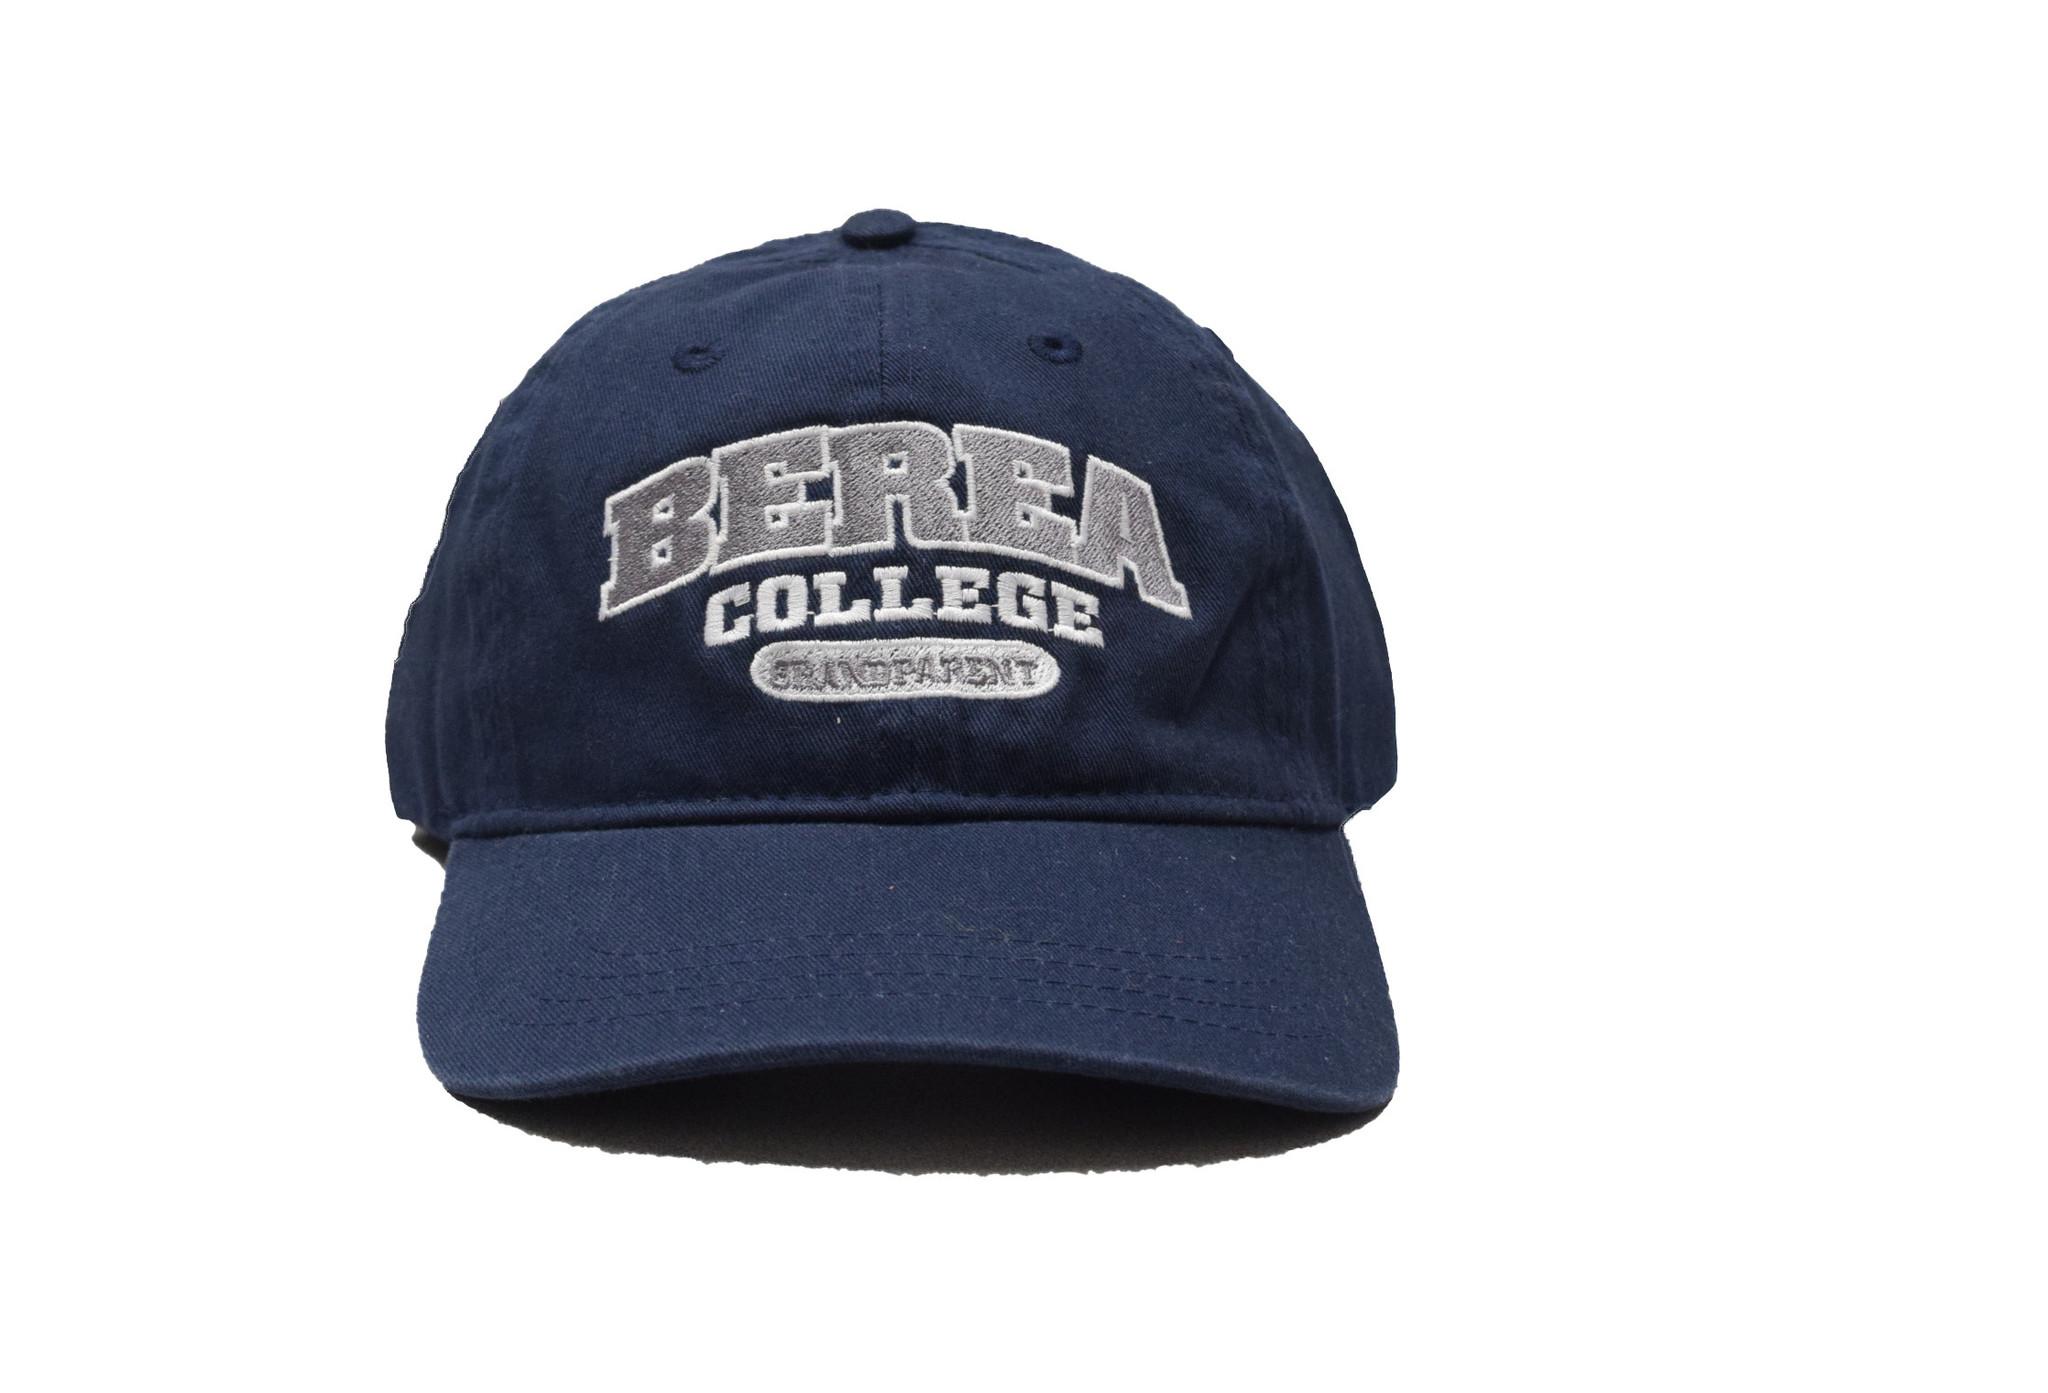 Navy Berea College Grandparent Ball Cap Strap-1